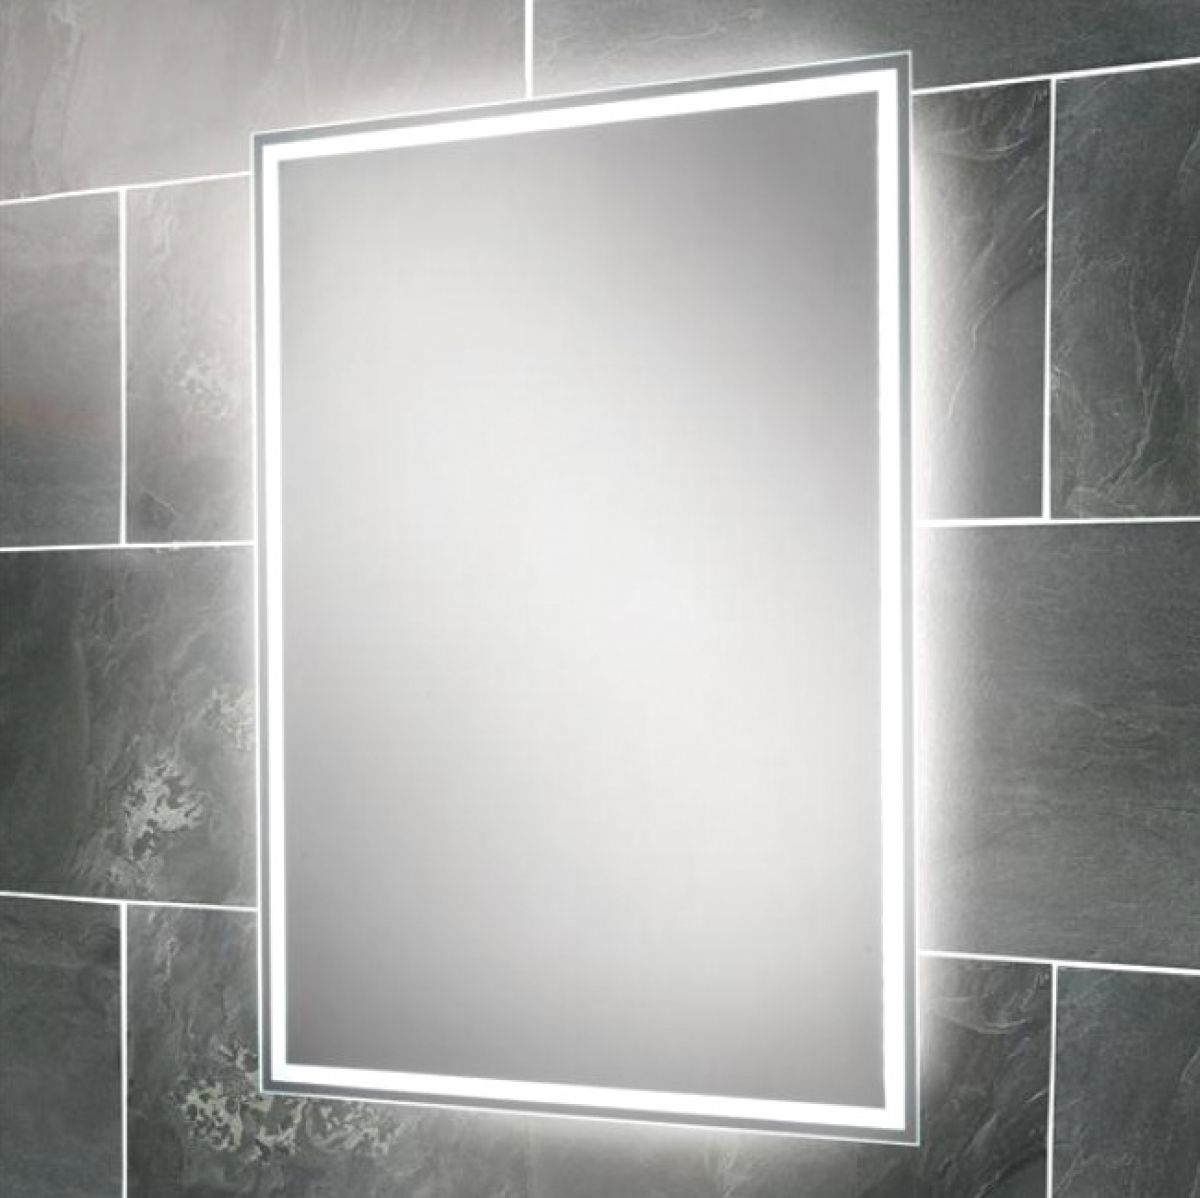 Hib ella illuminated mirror uk bathrooms for Illuminated mirrors for bathrooms